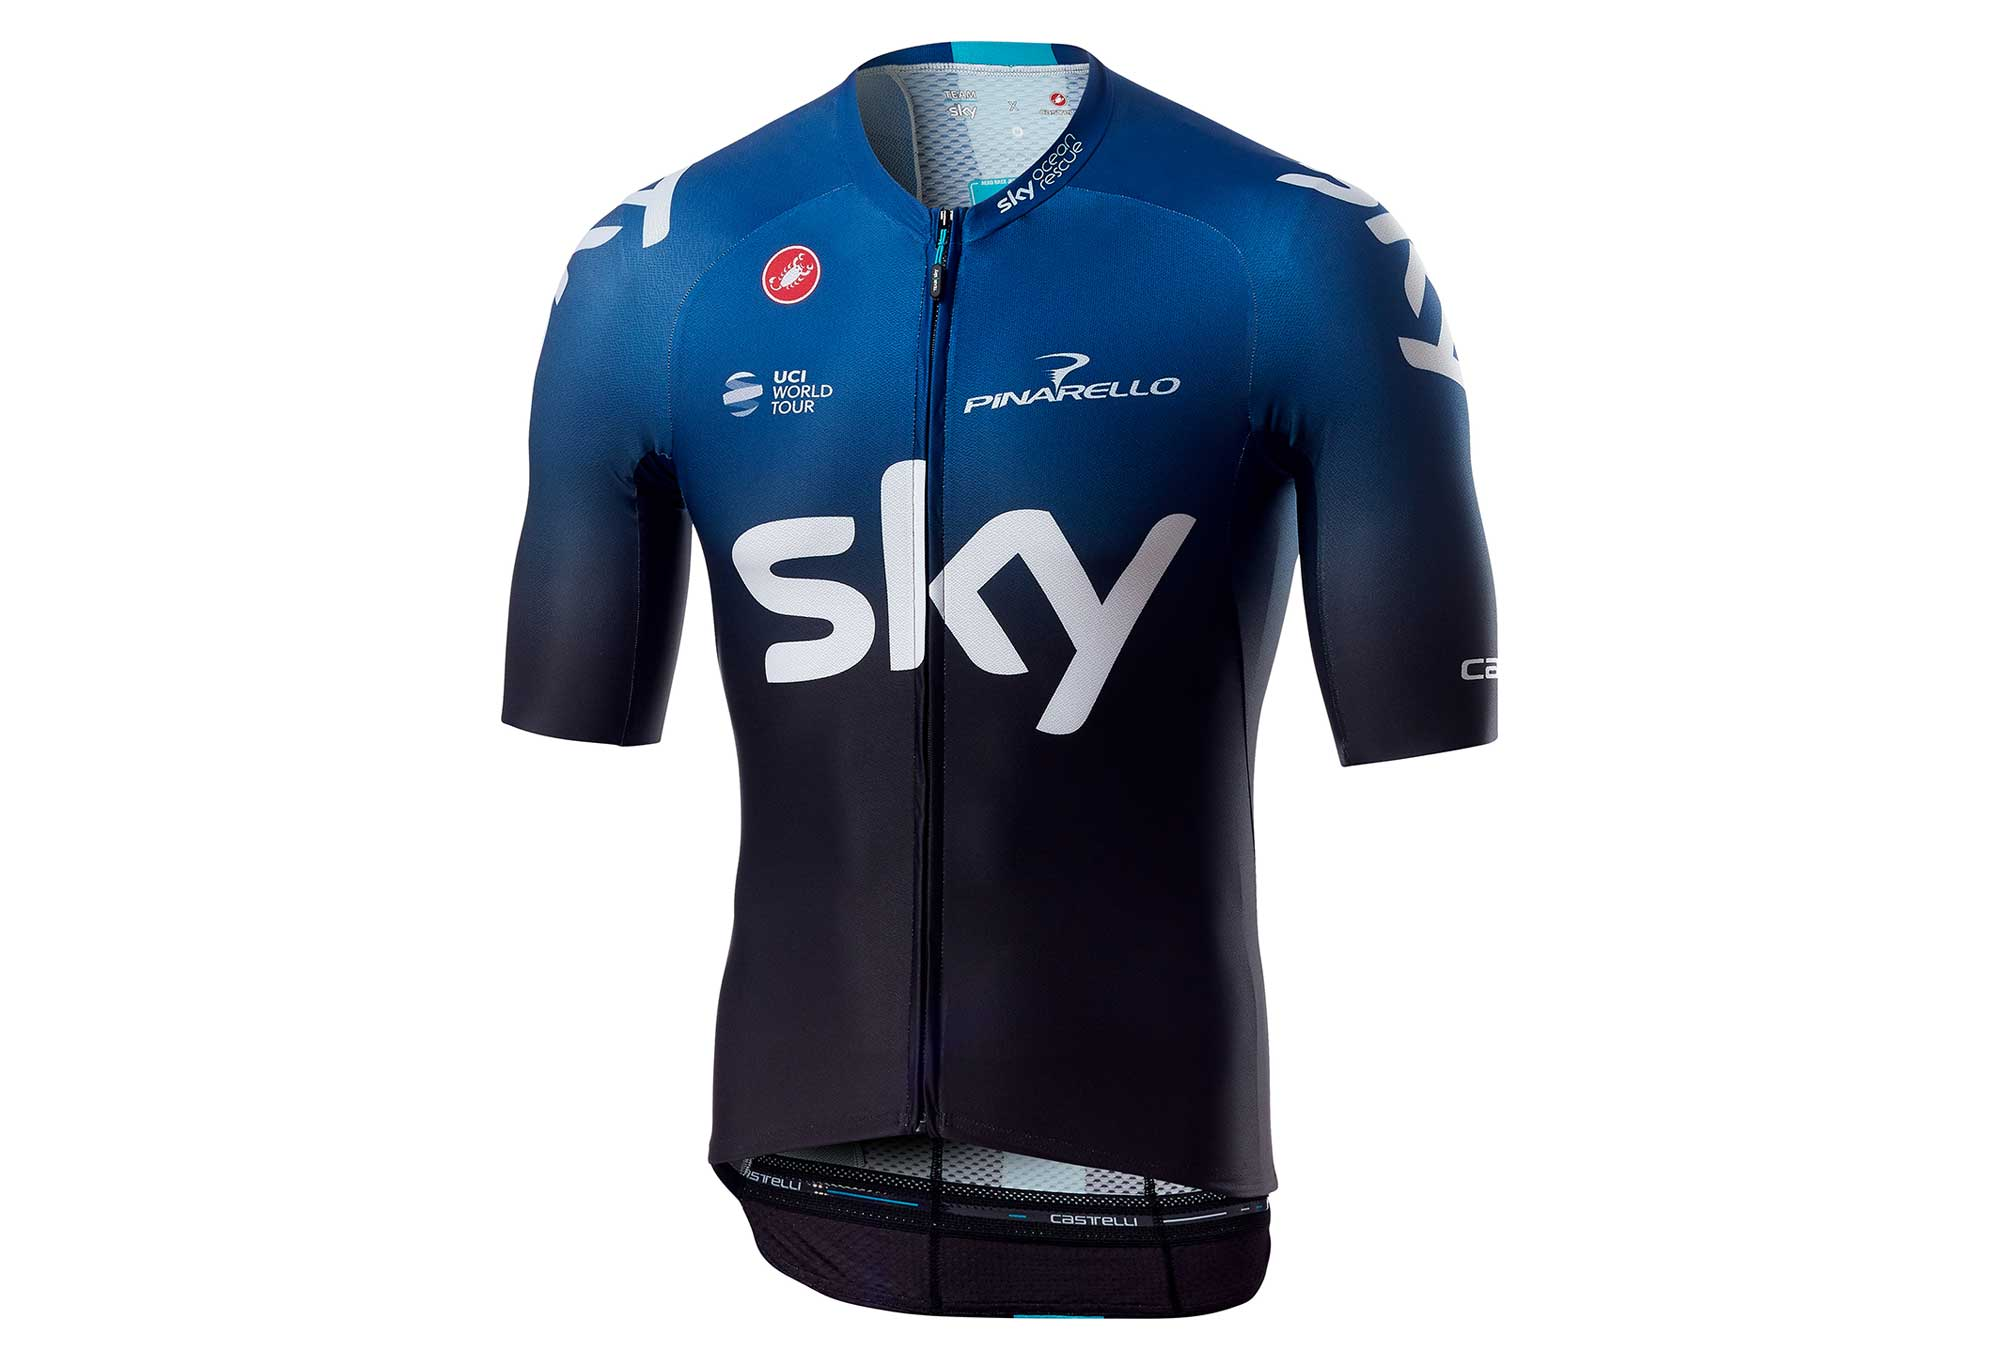 Castelli Aero Race 6.0 Team Sky 2019 Short Sleeves Jersey Black Light Blue   888b19e19